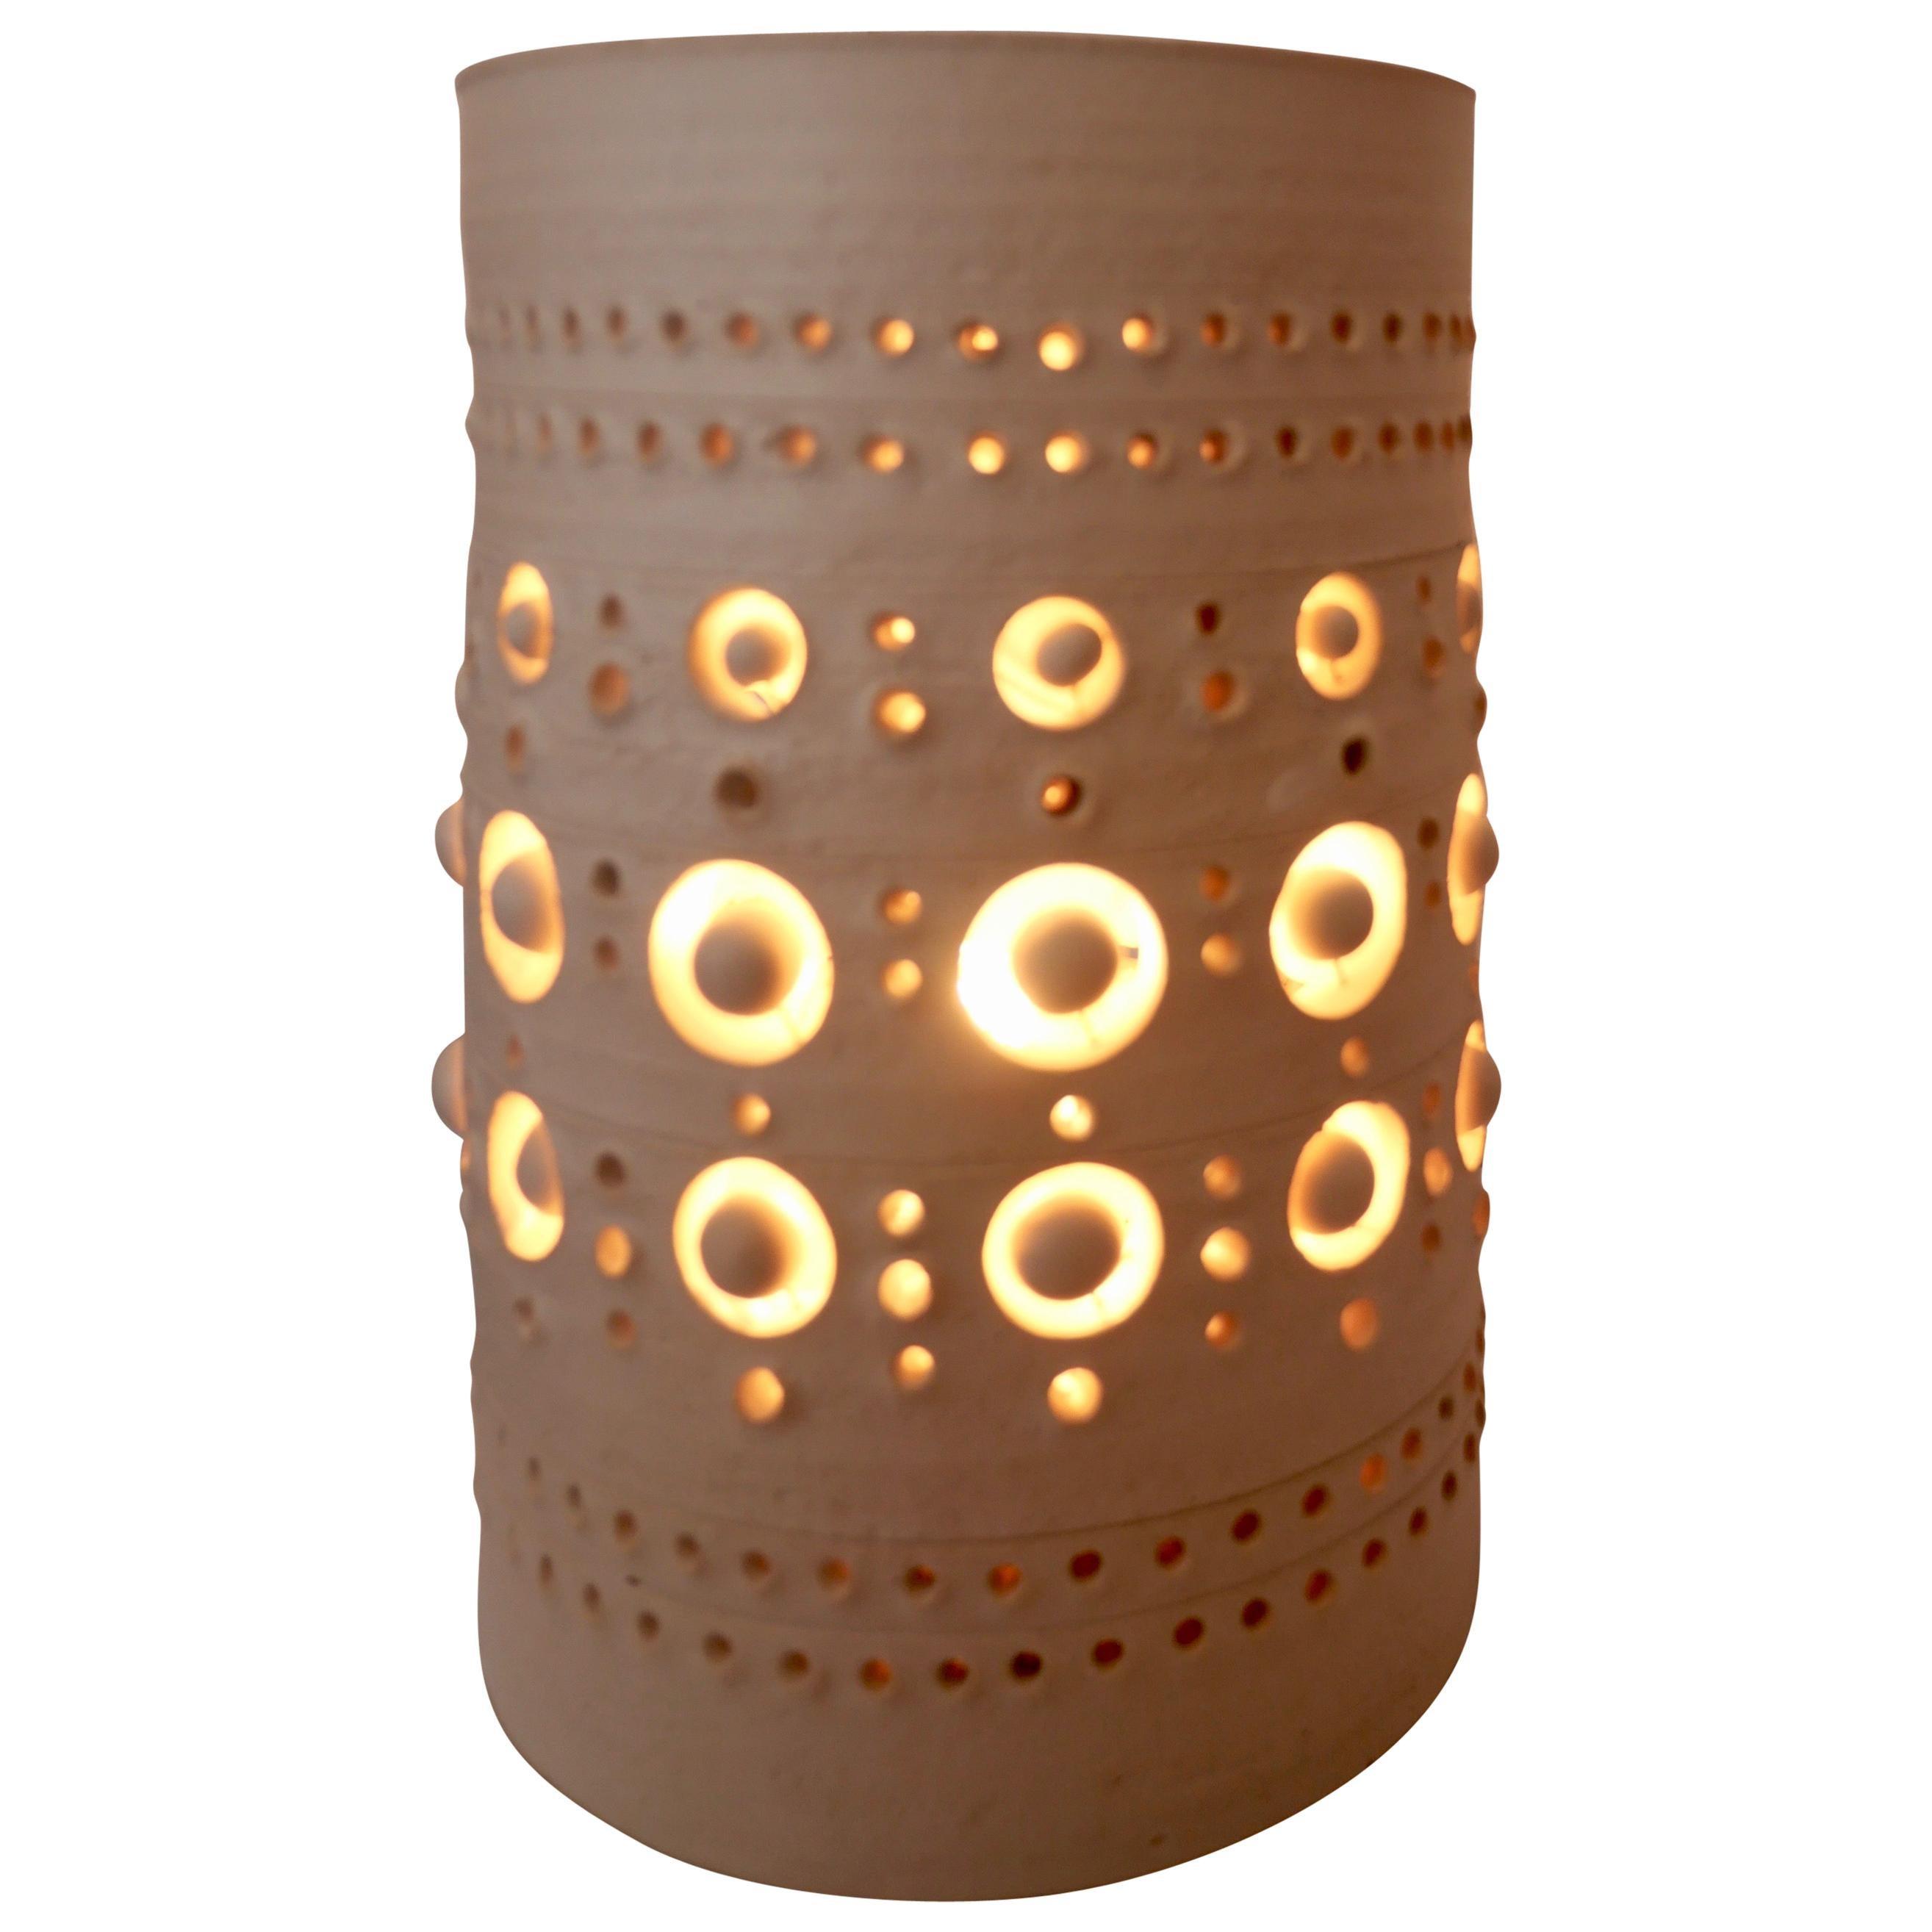 Georges Pelletier TOTEM Table Lamp, White Enamelled Ceramic, France, 2020